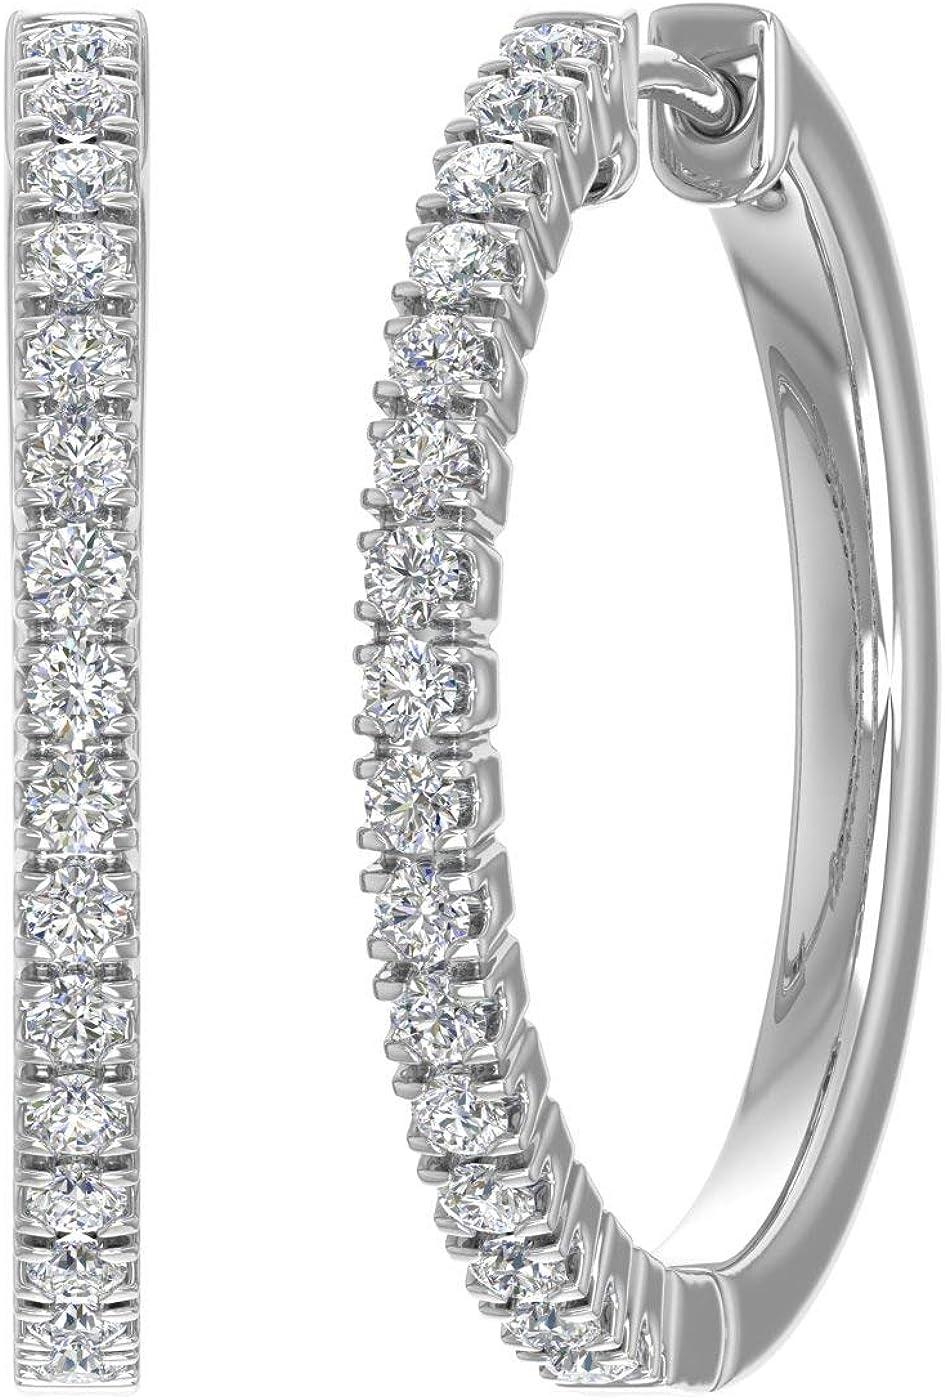 Earrings | Classic/Stud | Princess Cut Stud Earrings